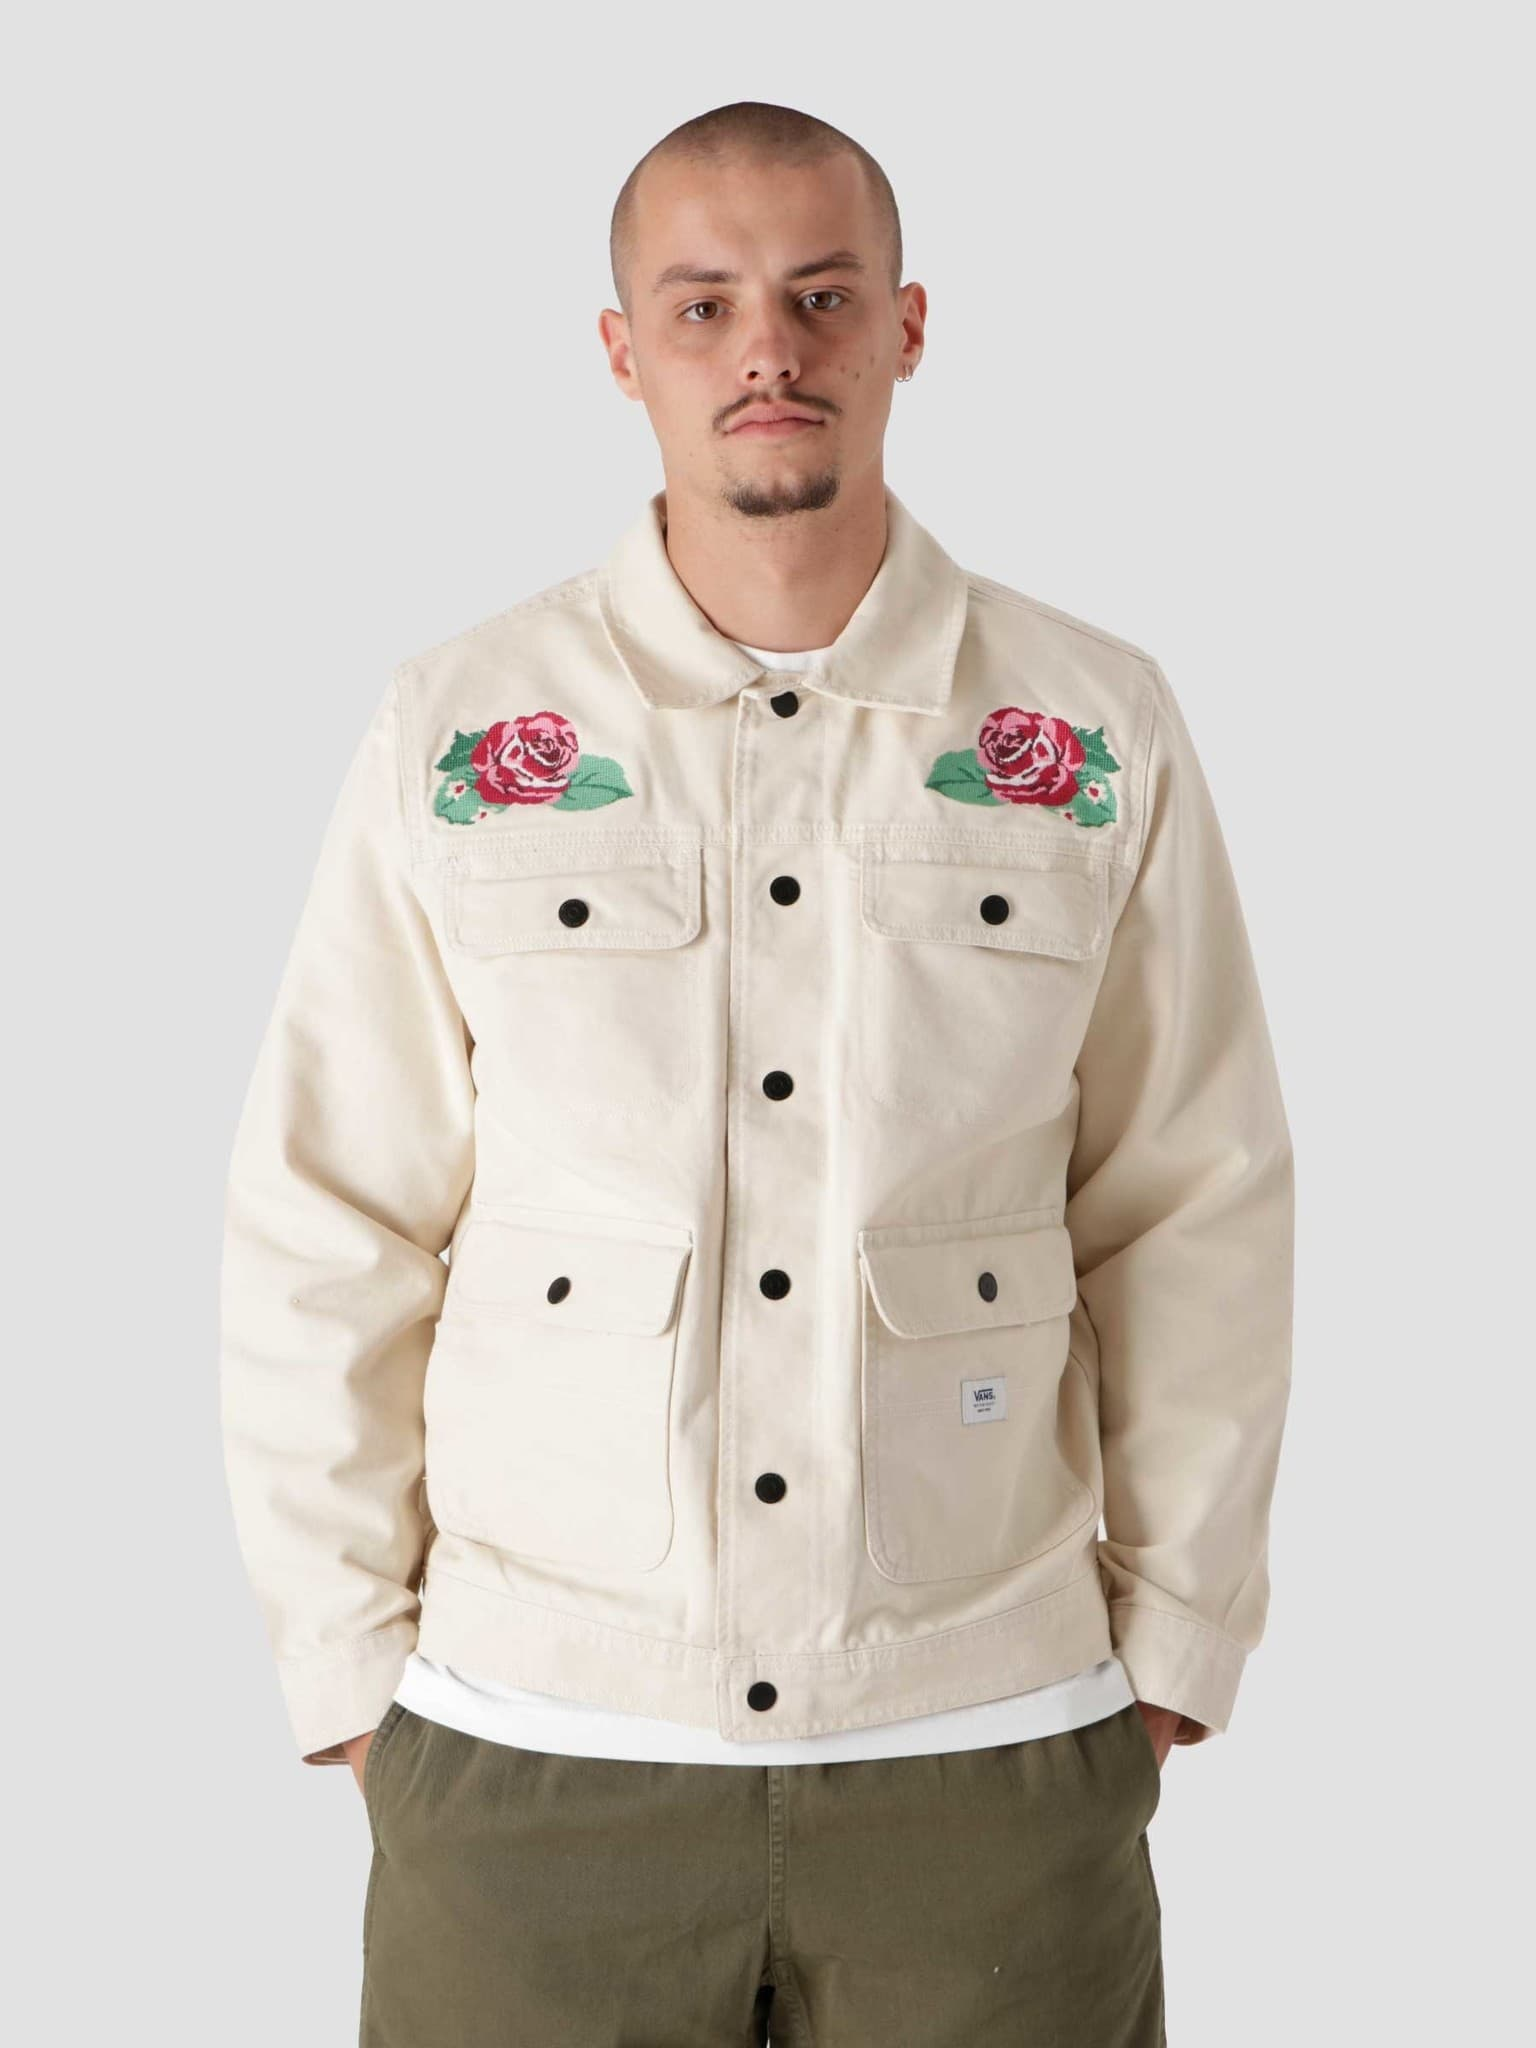 MM Anaheim Needlepoint Floral Jacket VN0A5FQ77VJ1